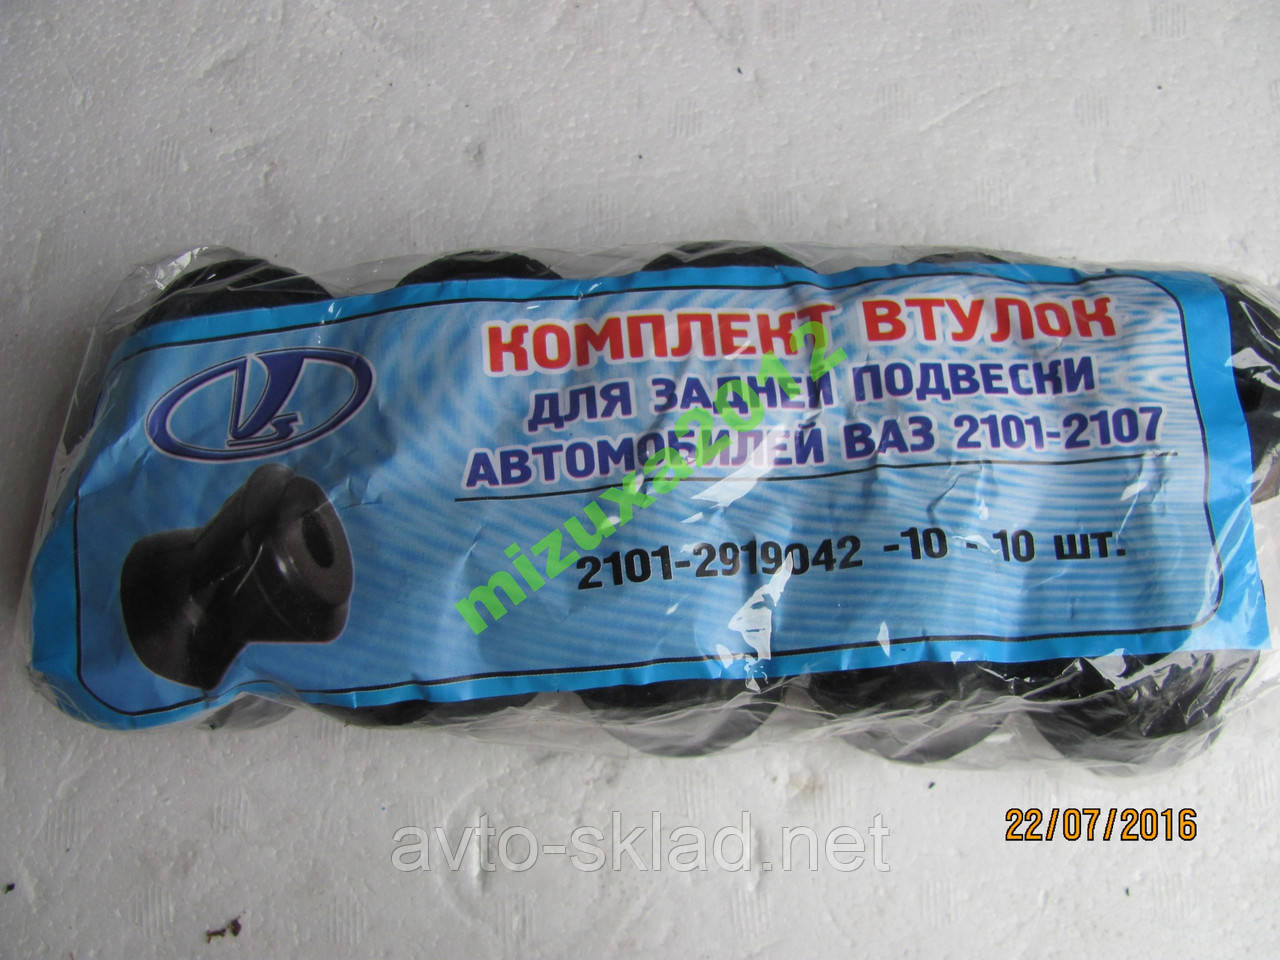 Втулки реактивных штанг (тяг) 2121 10 штук